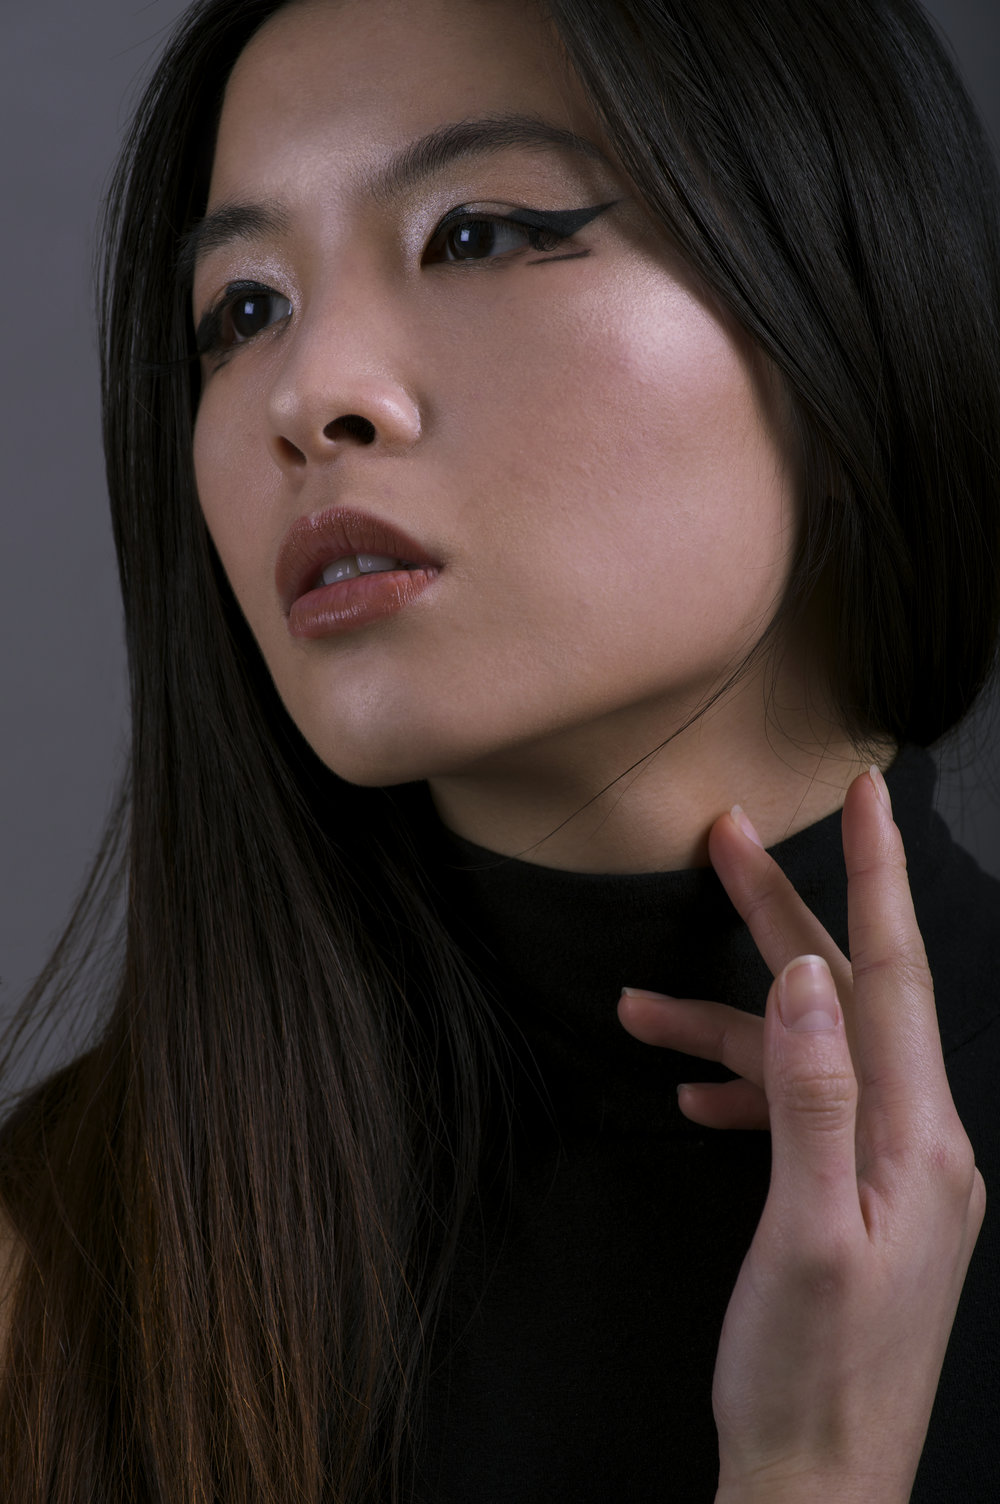 Photographer: Andrezej Gruszka  Model: Sophia Chang  Hair & Makeup Artist: Sarah Shaw